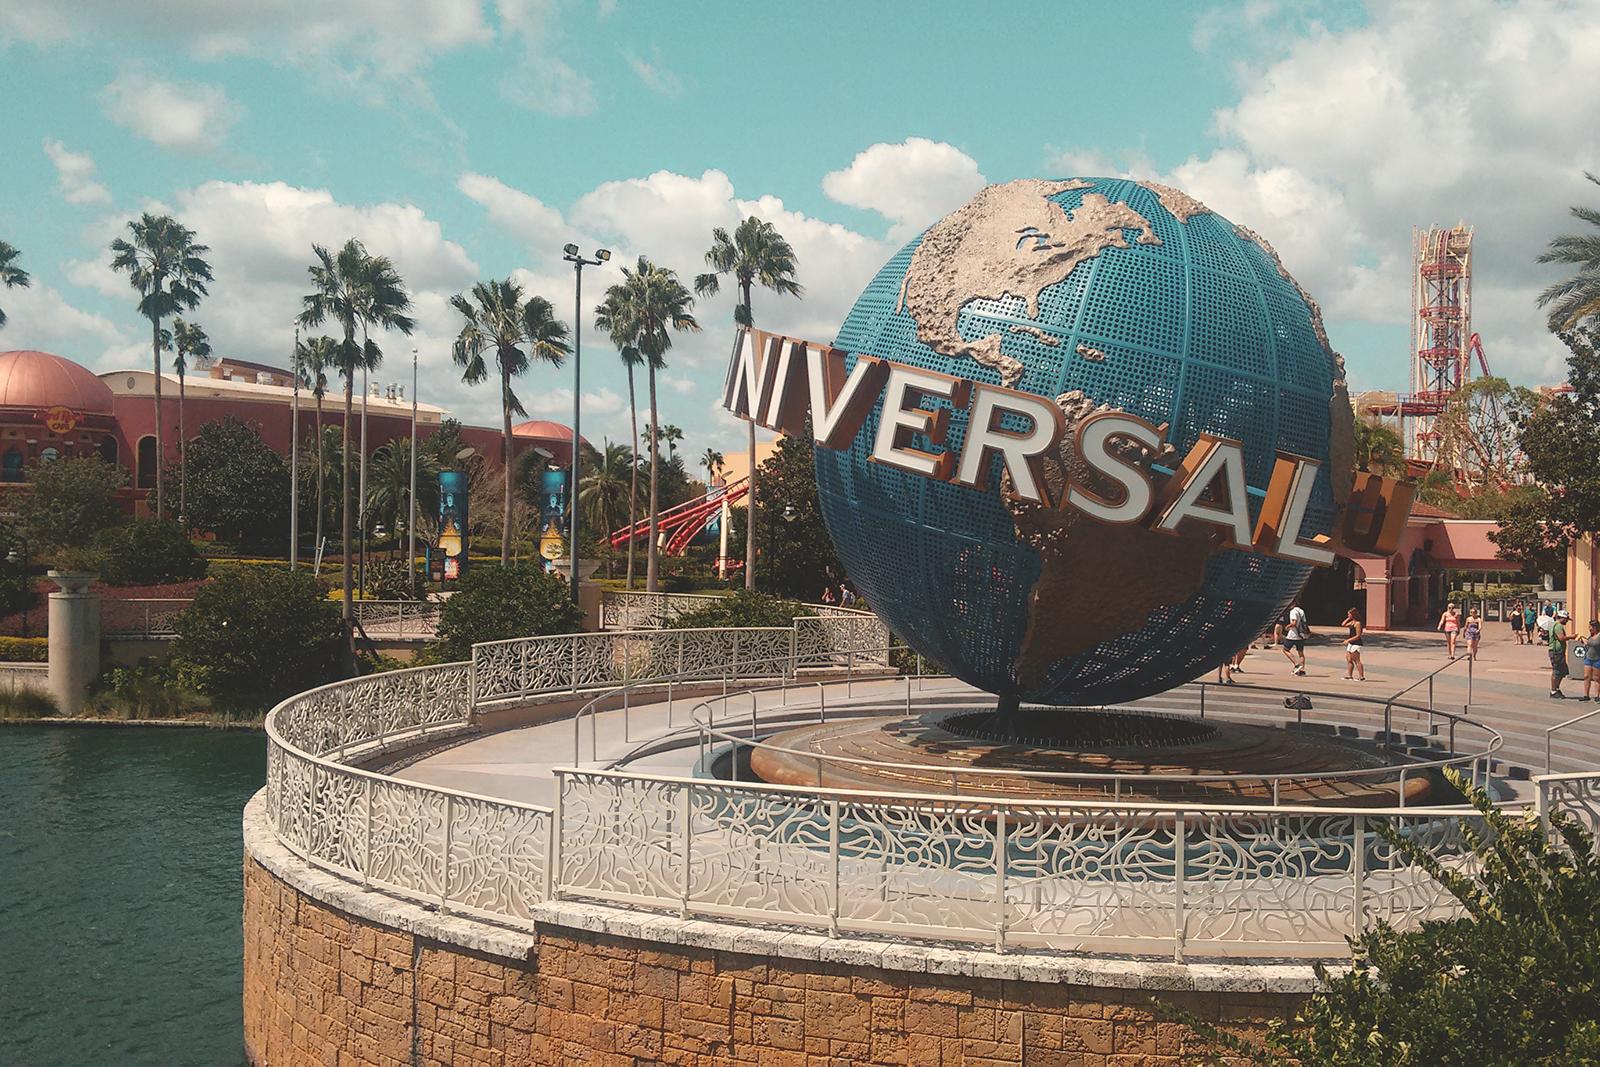 globo-universal-studios